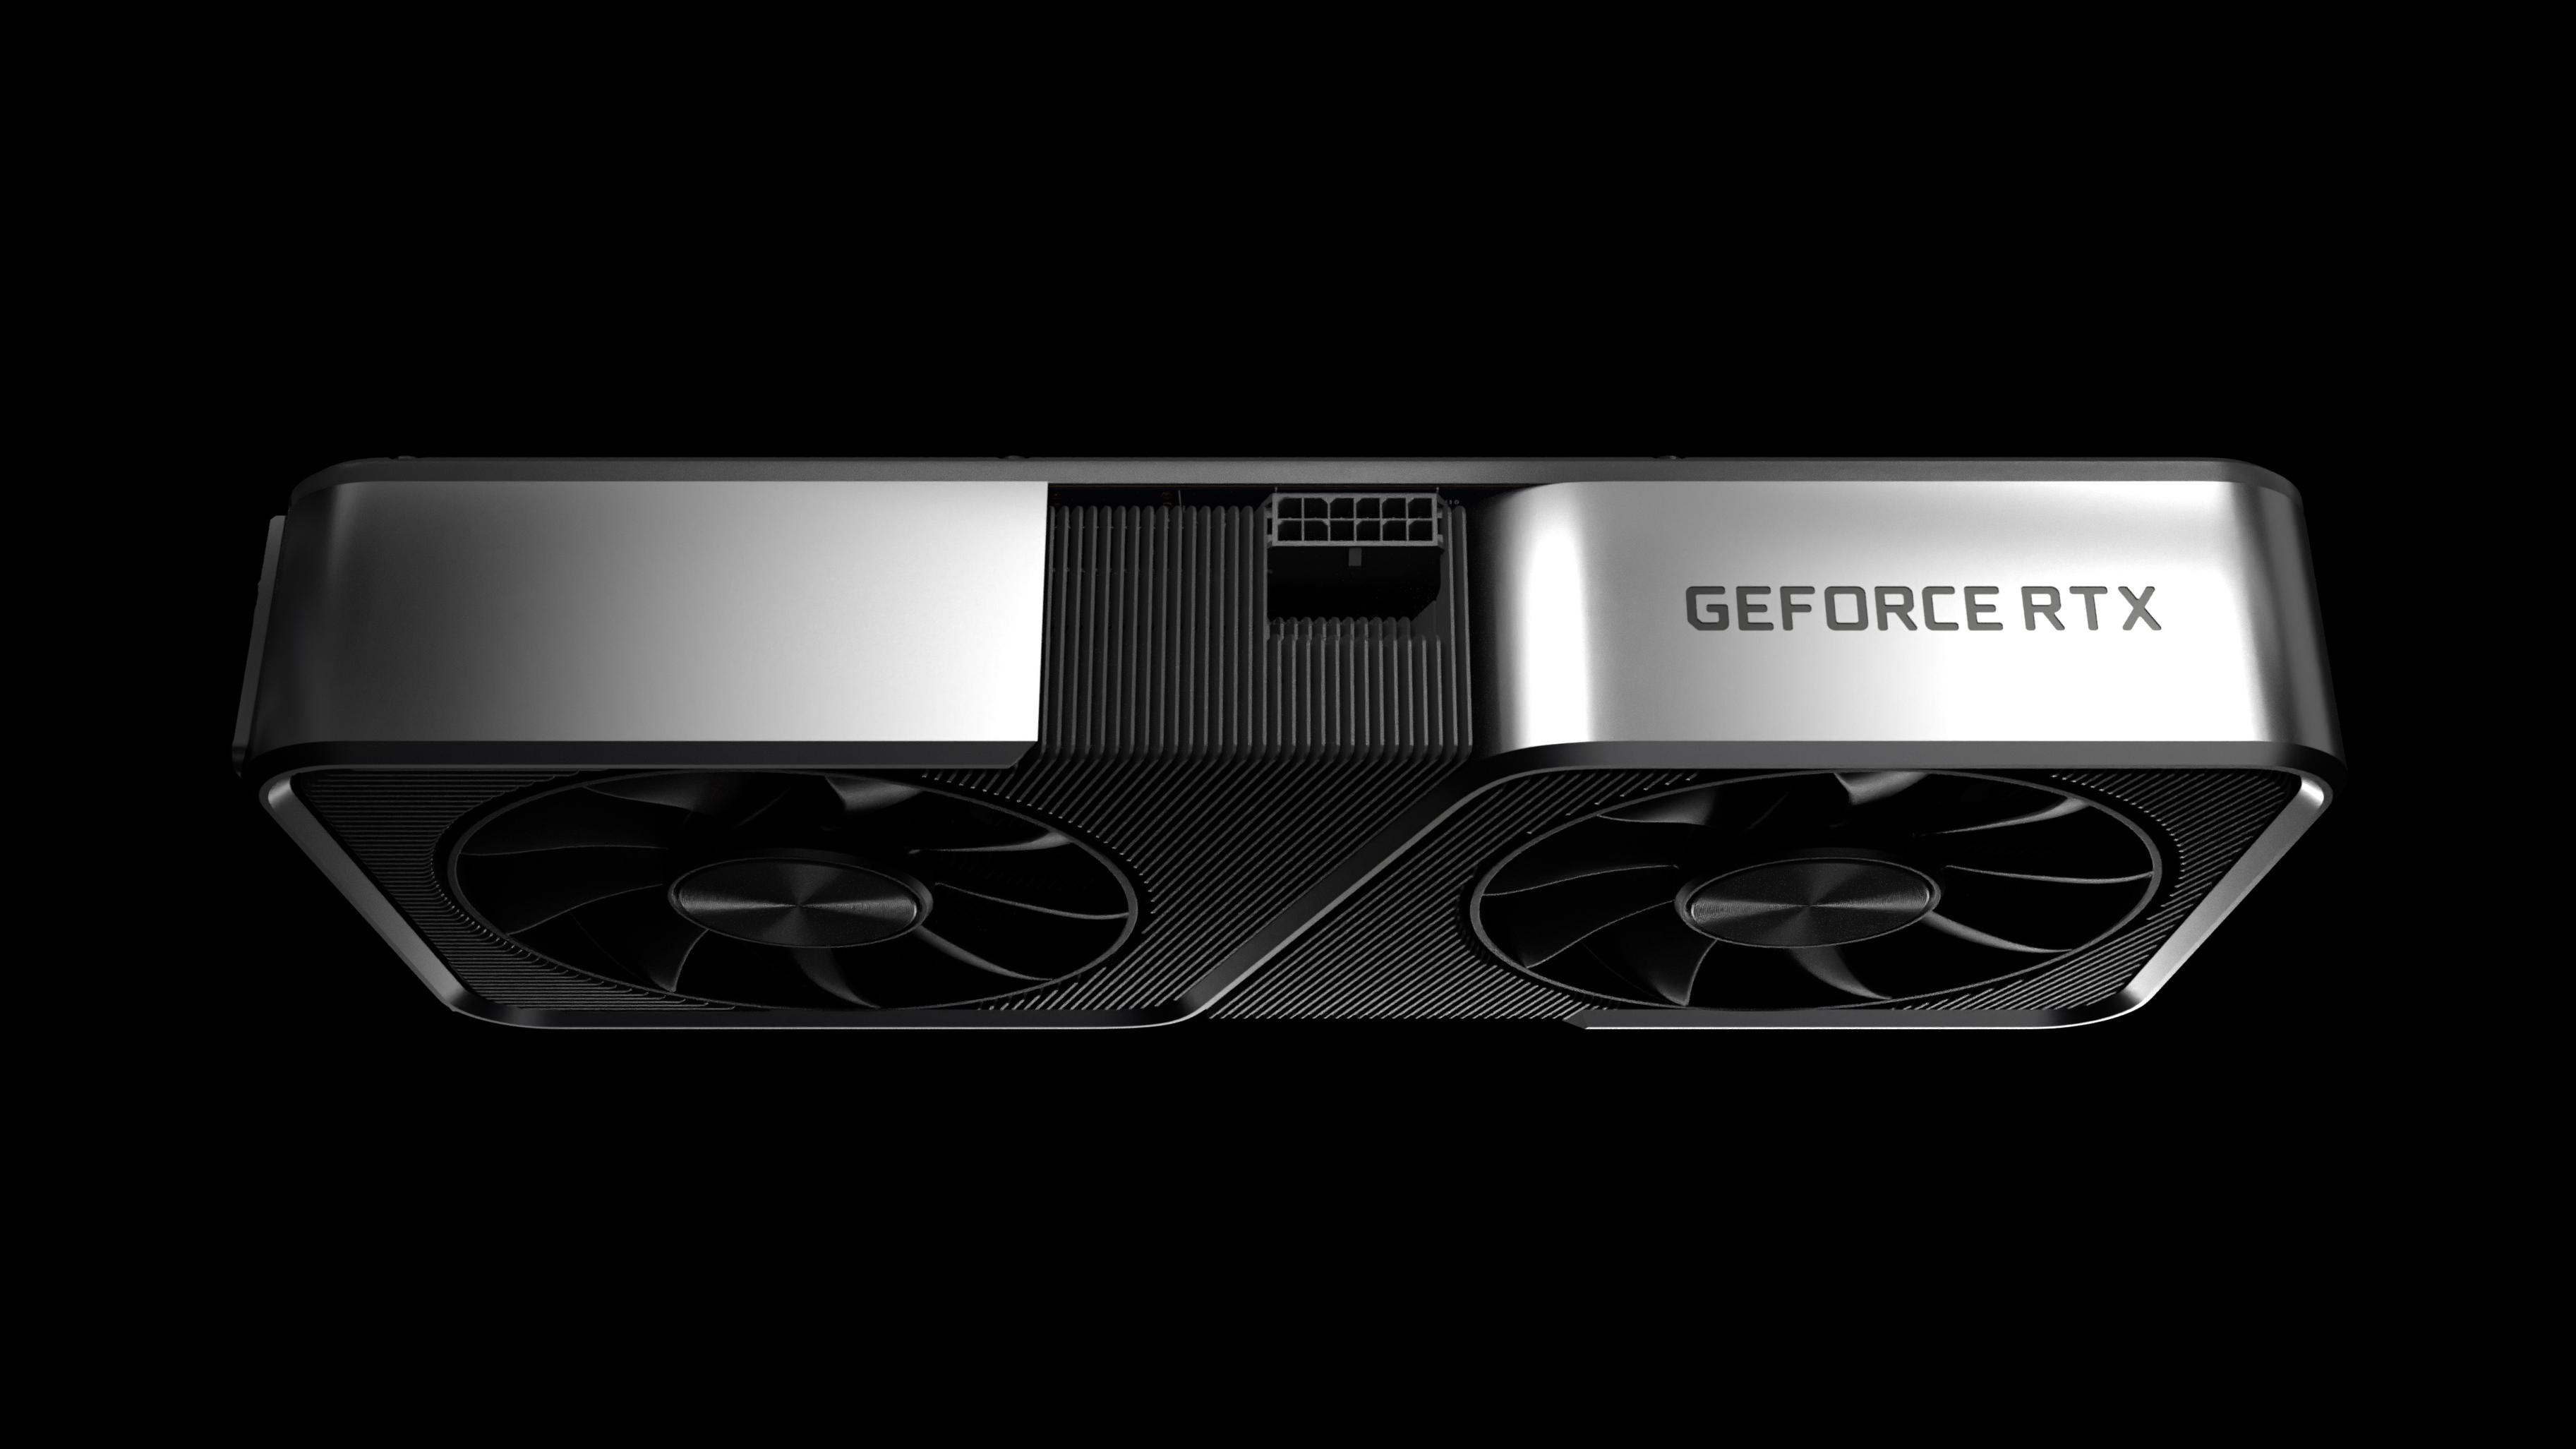 Новейшая видеокарта NVIDIA RTX 3070 по скорости не превзошла старую RTX 2080 Ti